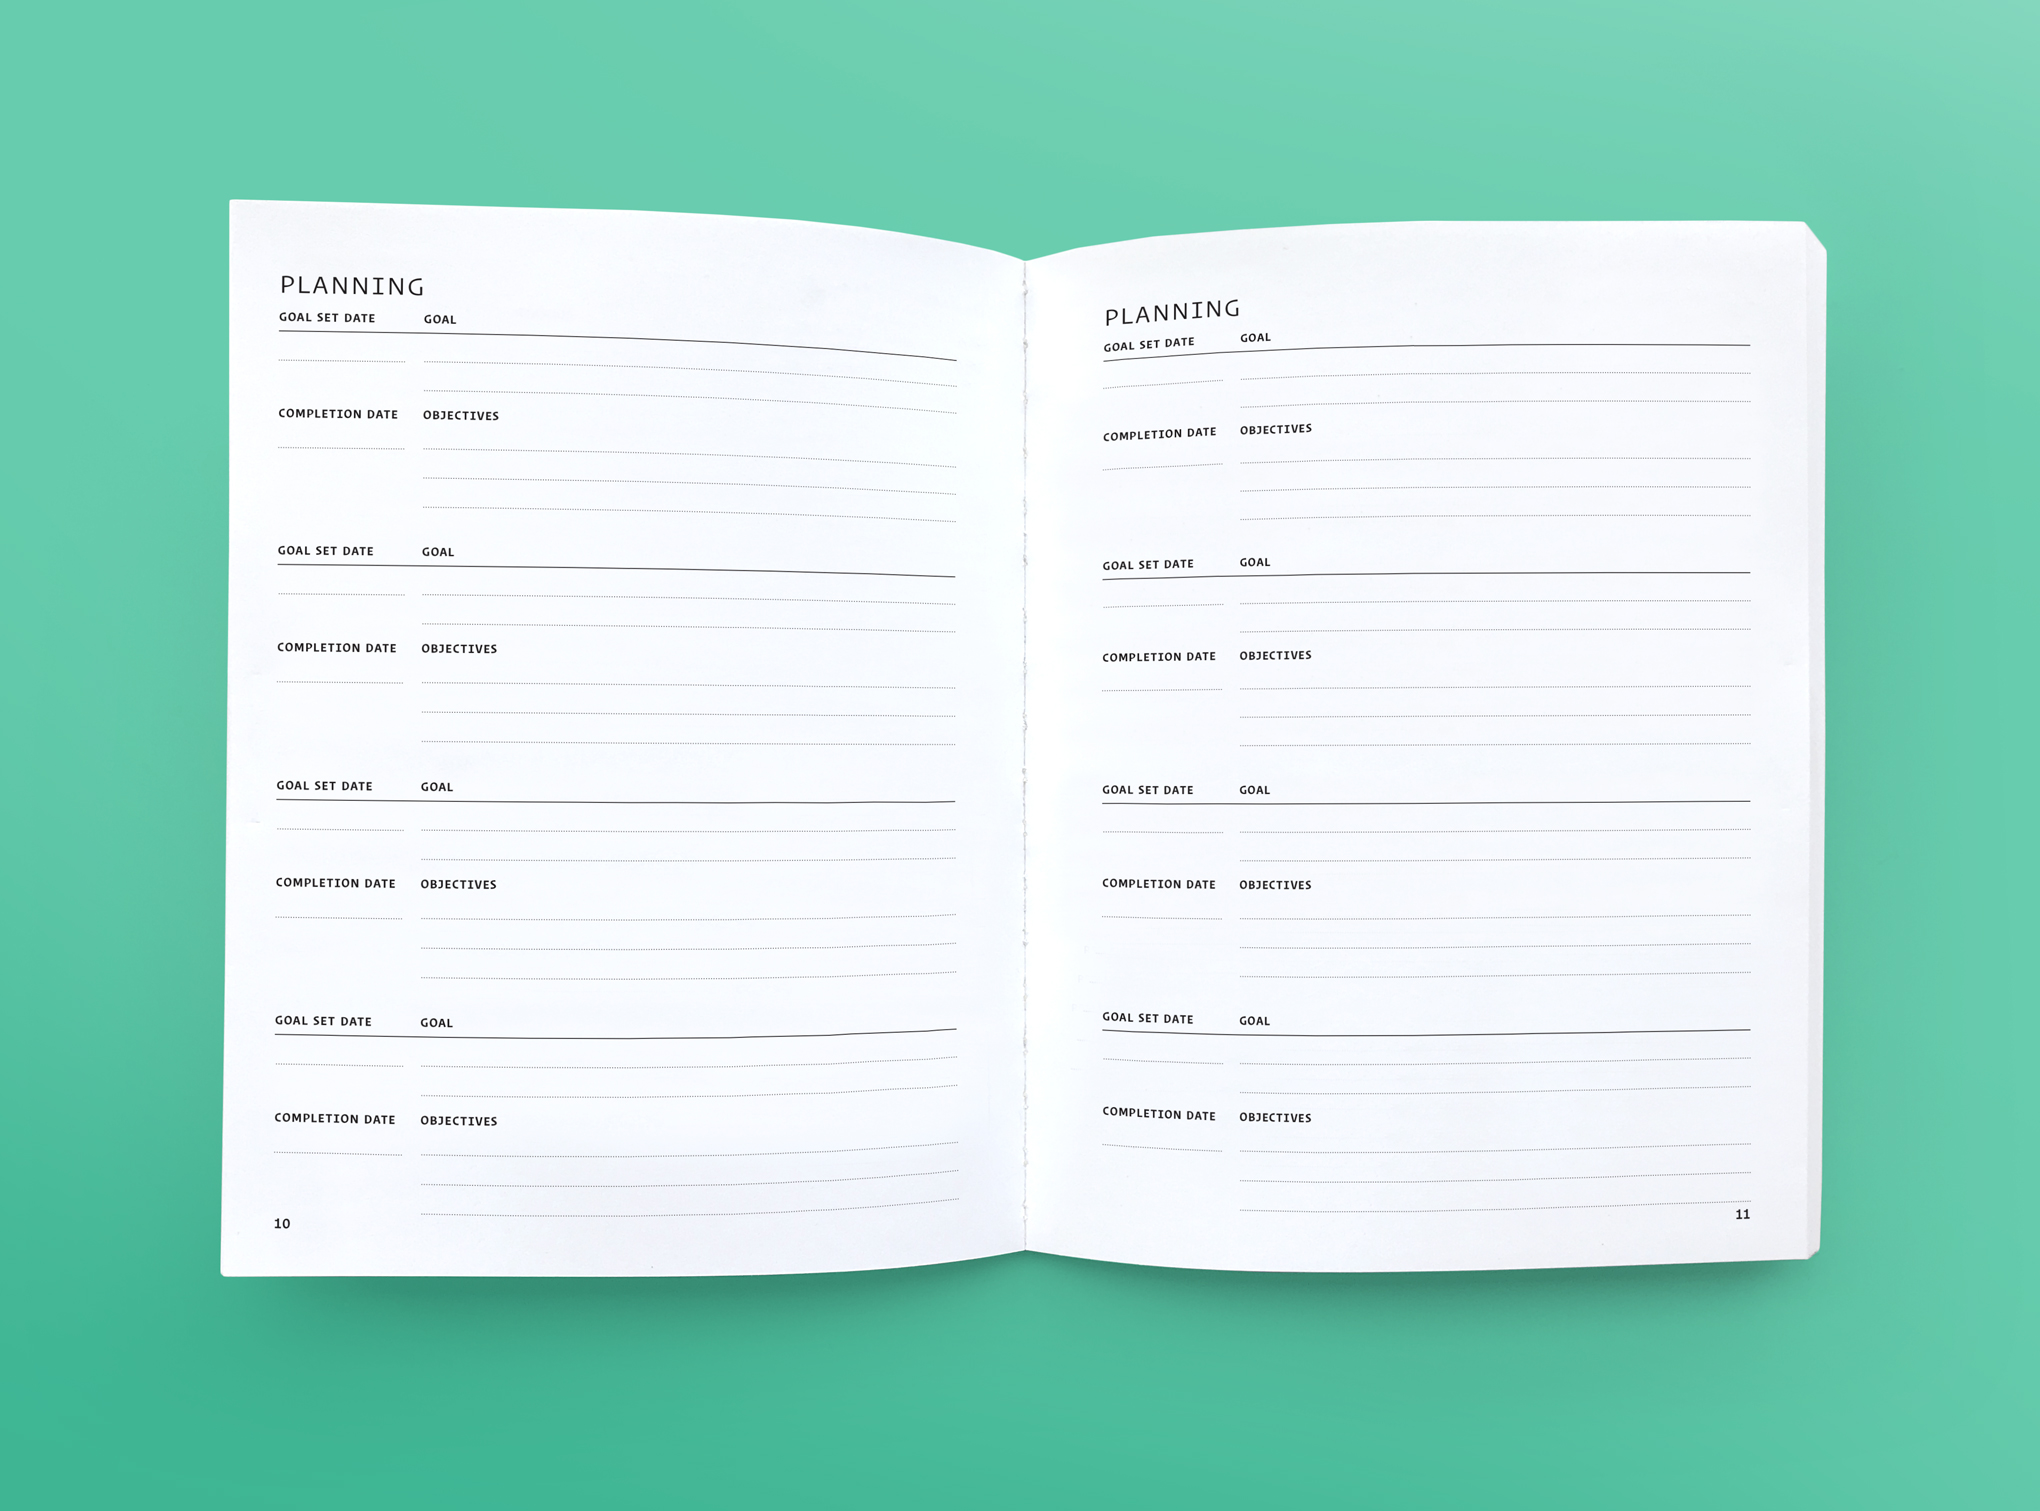 LD_PracticeJournal_Kickstarter-Planning.jpg